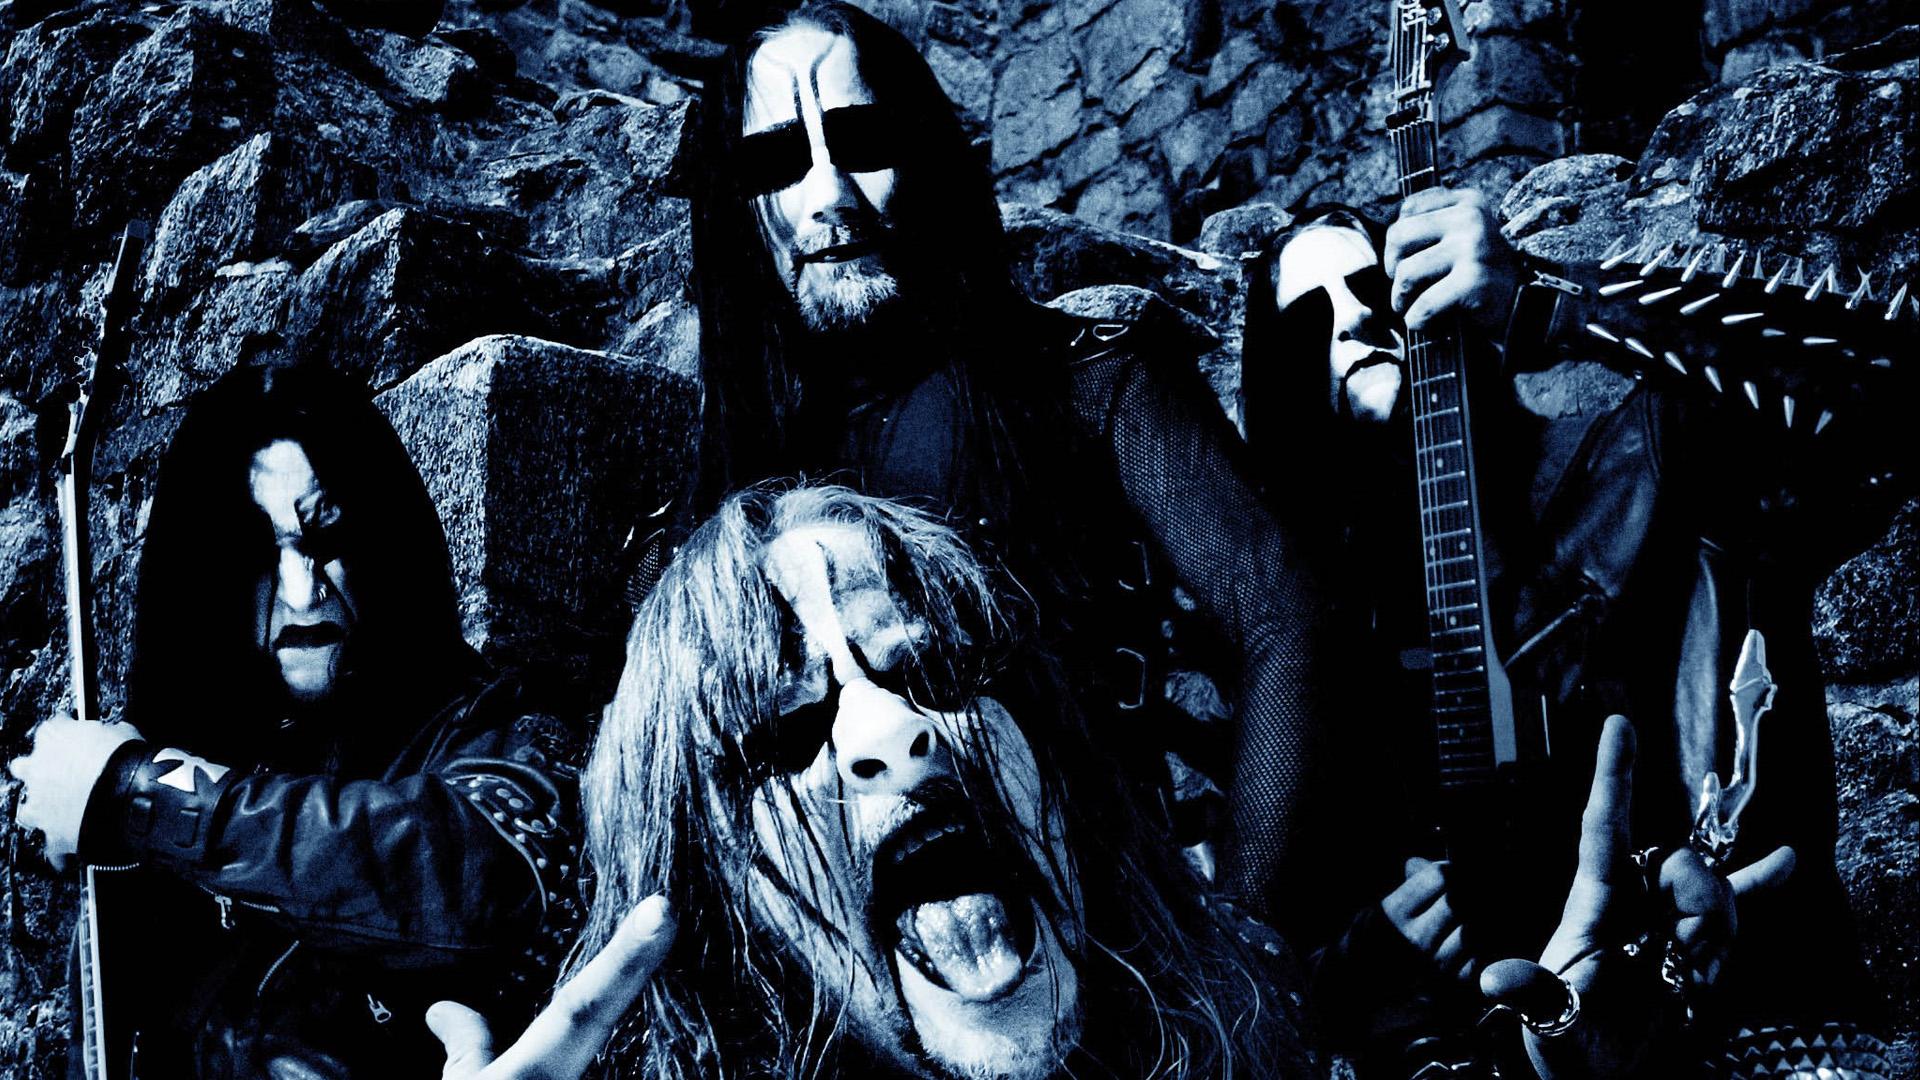 Wallpaper 1920x1080 Px Band Bands Black Dark Funeral